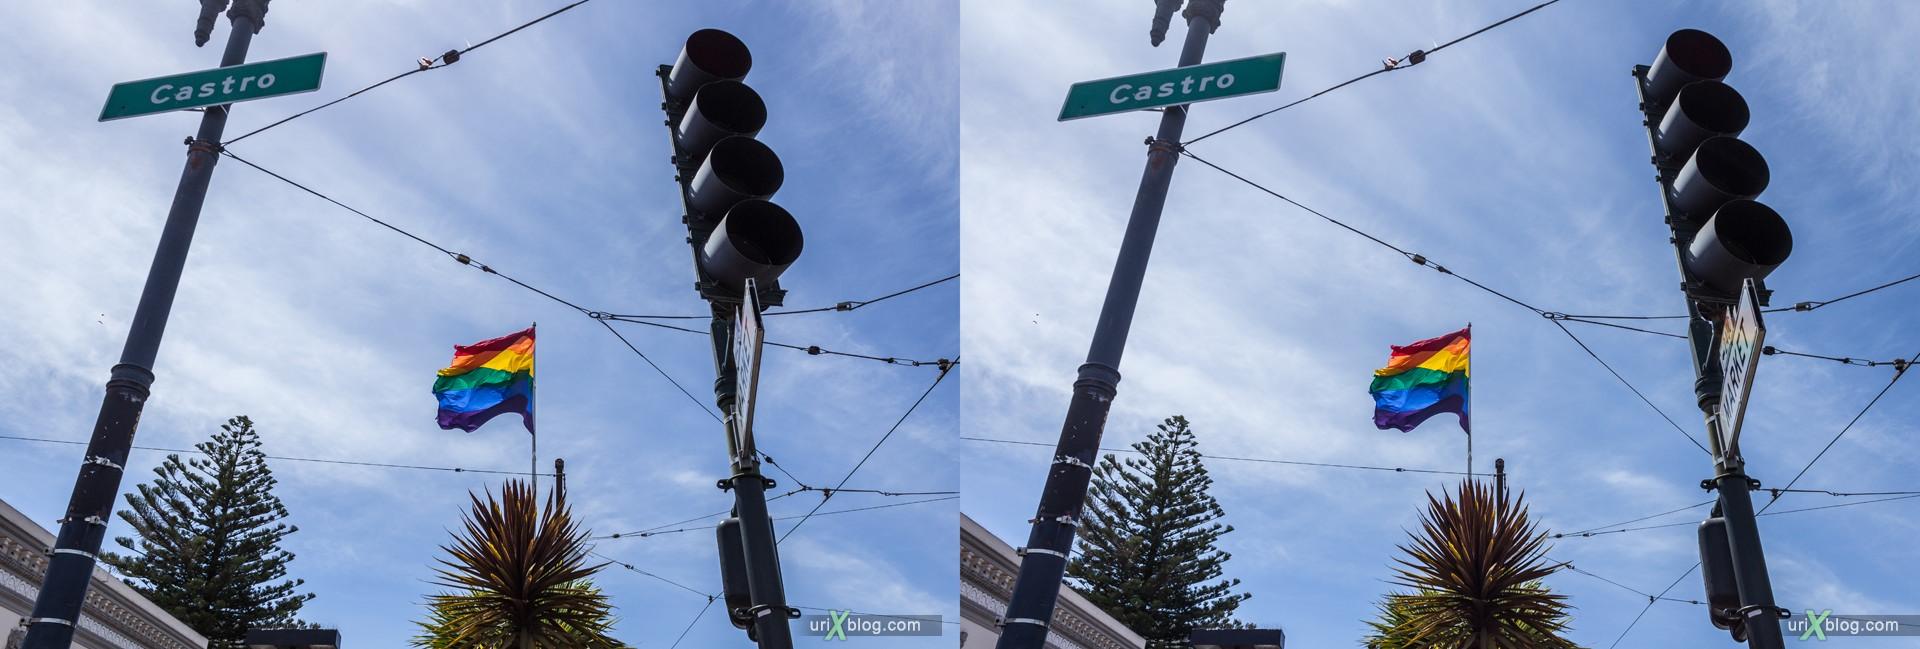 2013, Castro rainbow flag, Сан-Франциско, США, 3D, перекрёстные стереопары, стерео, стереопара, стереопары